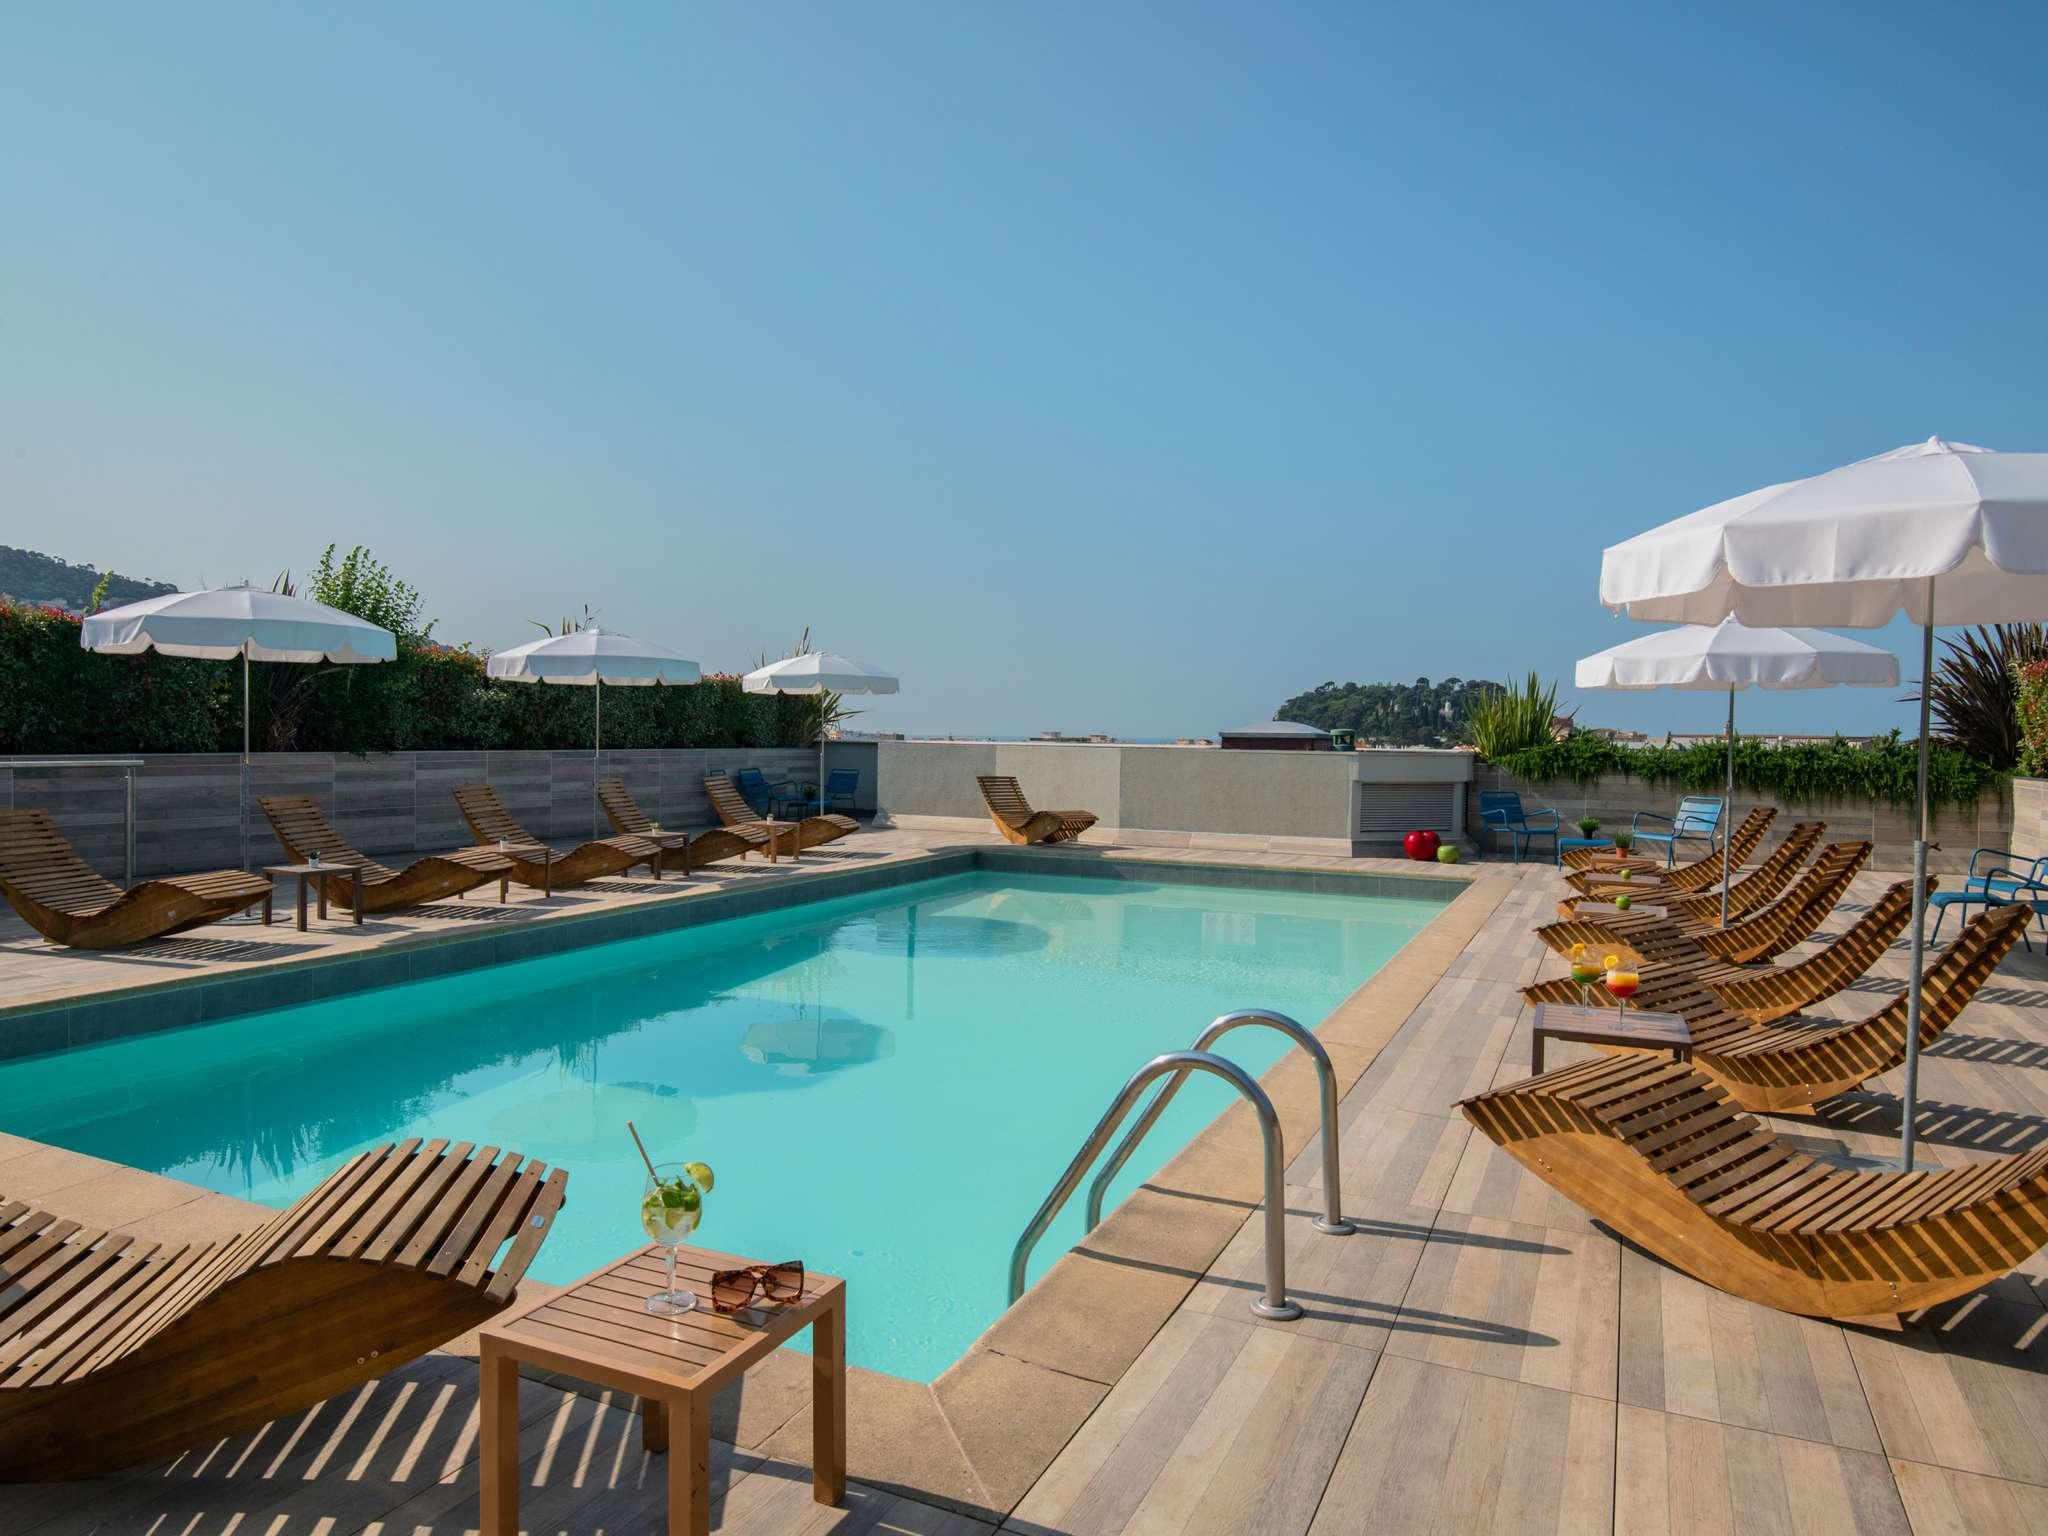 Hotel – Novotel Nice Centre Vieux Nice